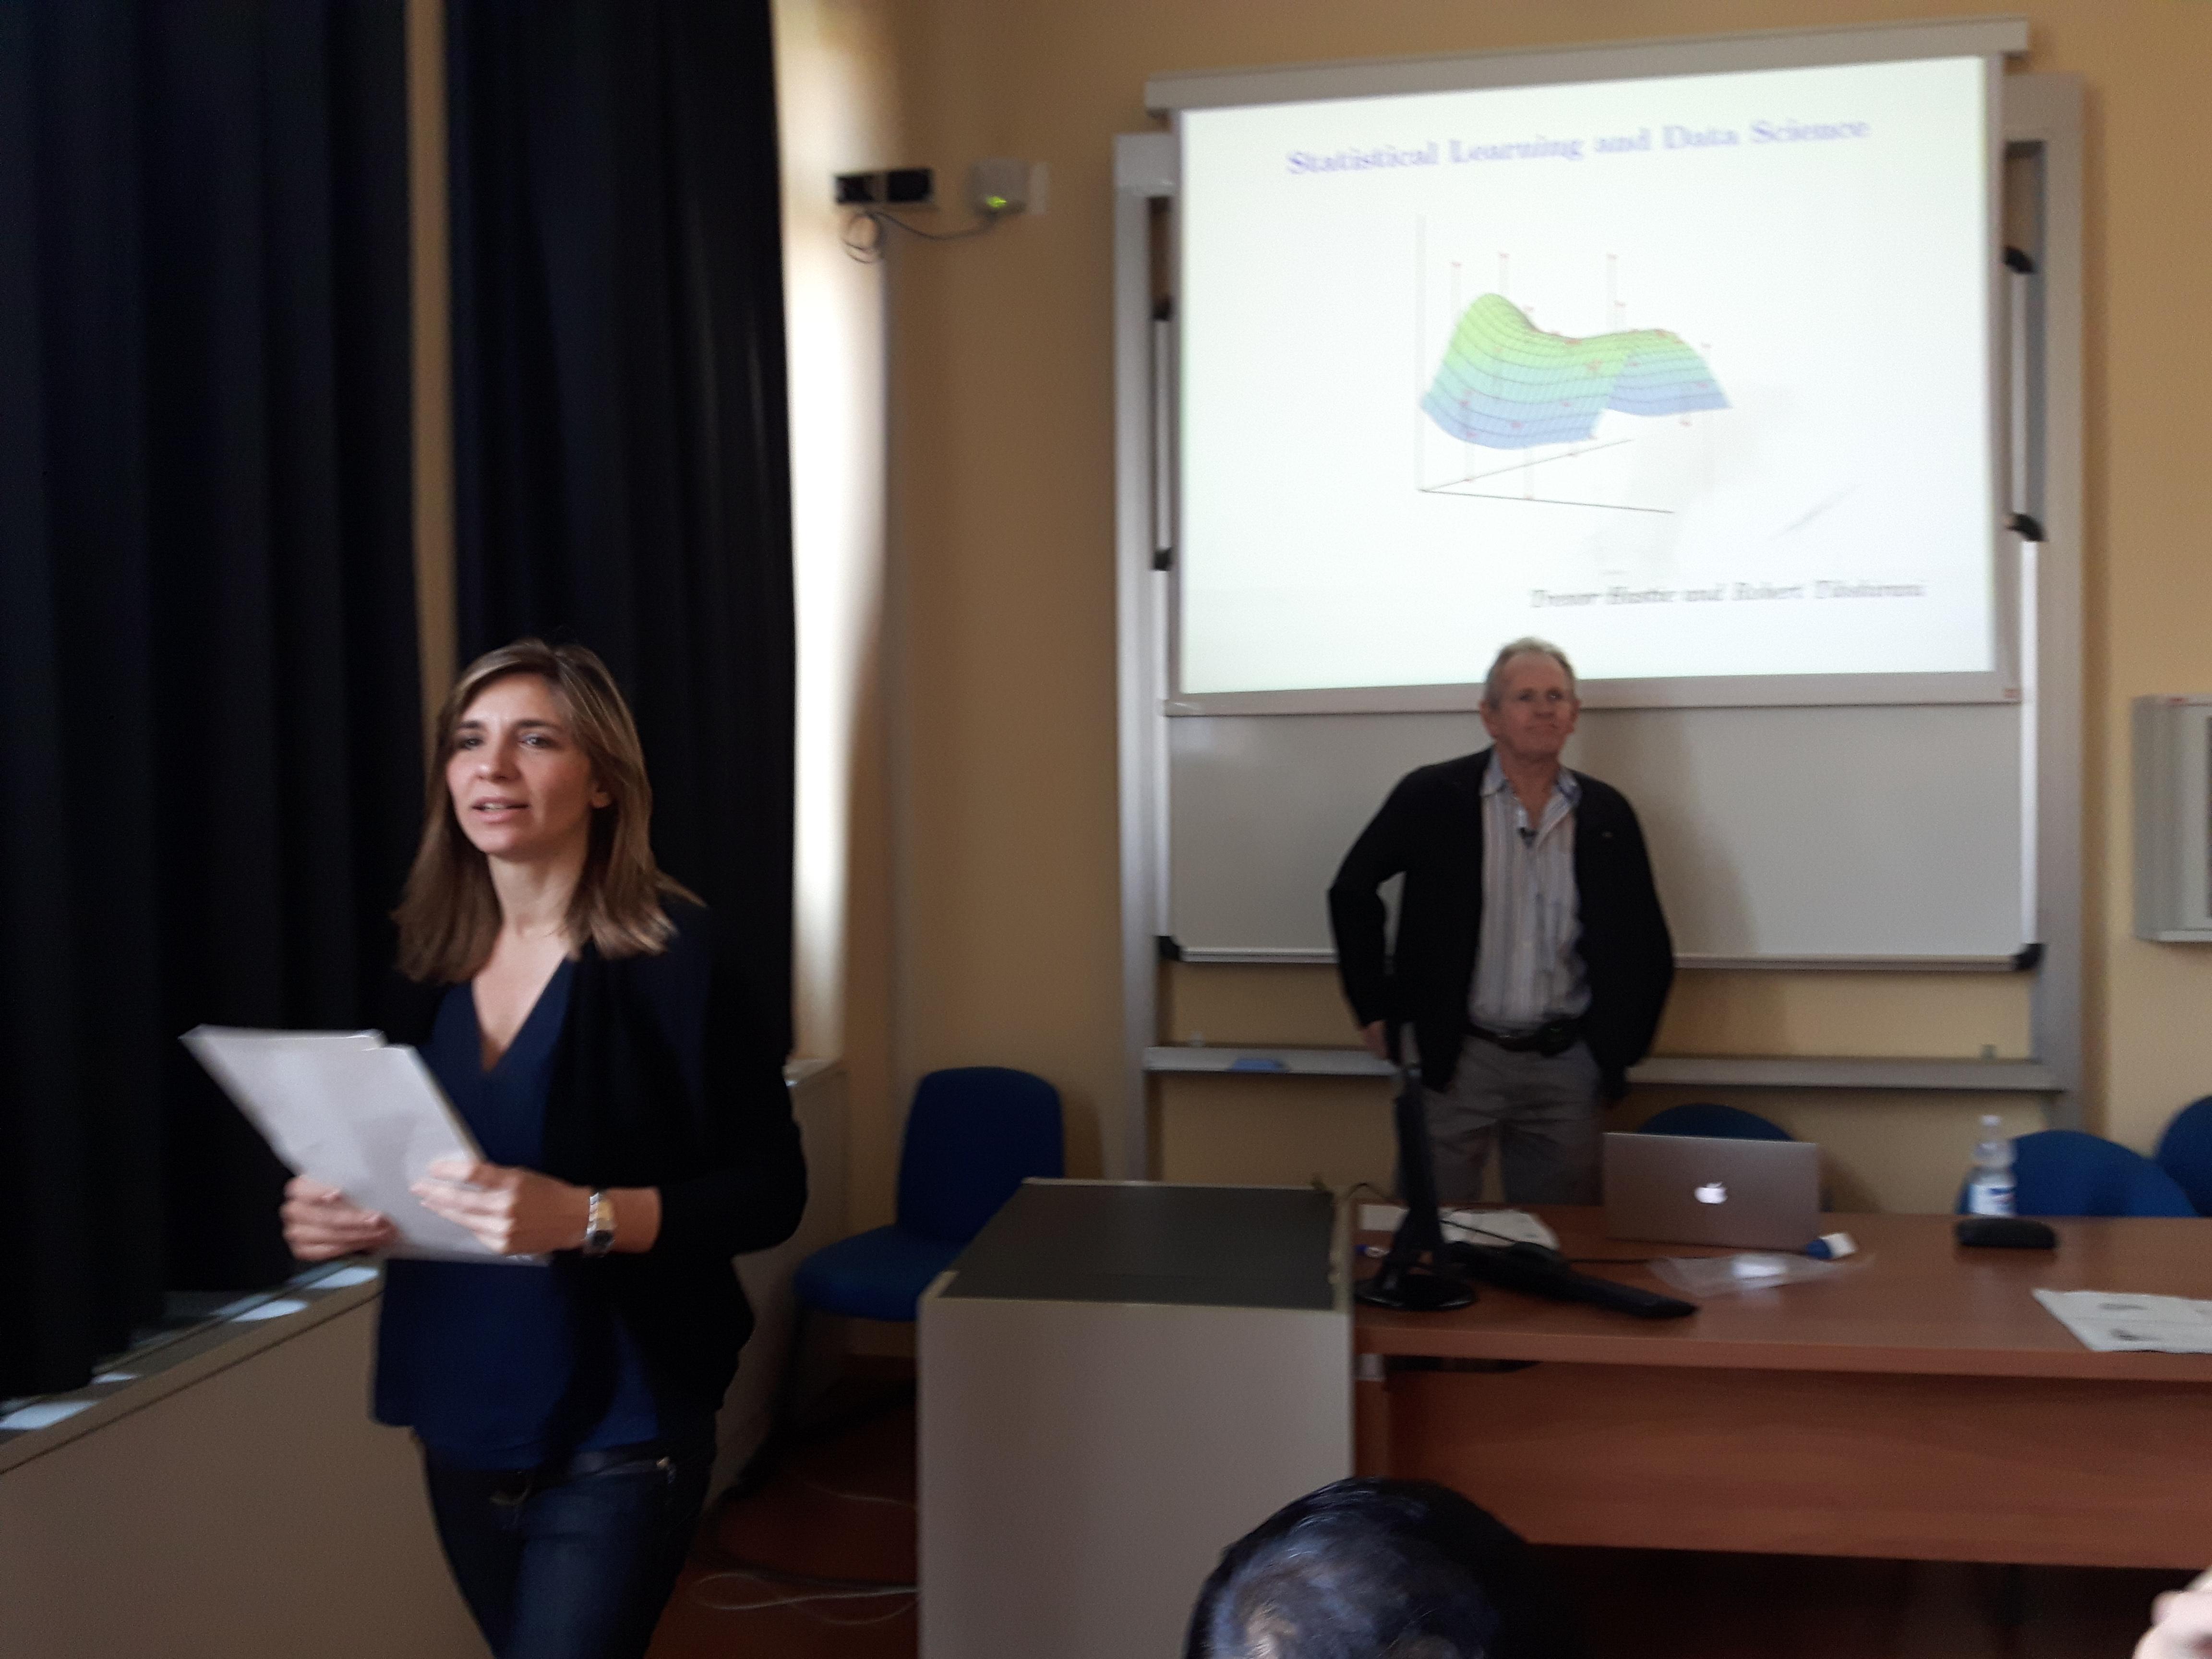 Trevor Hastie Lectures In Padova